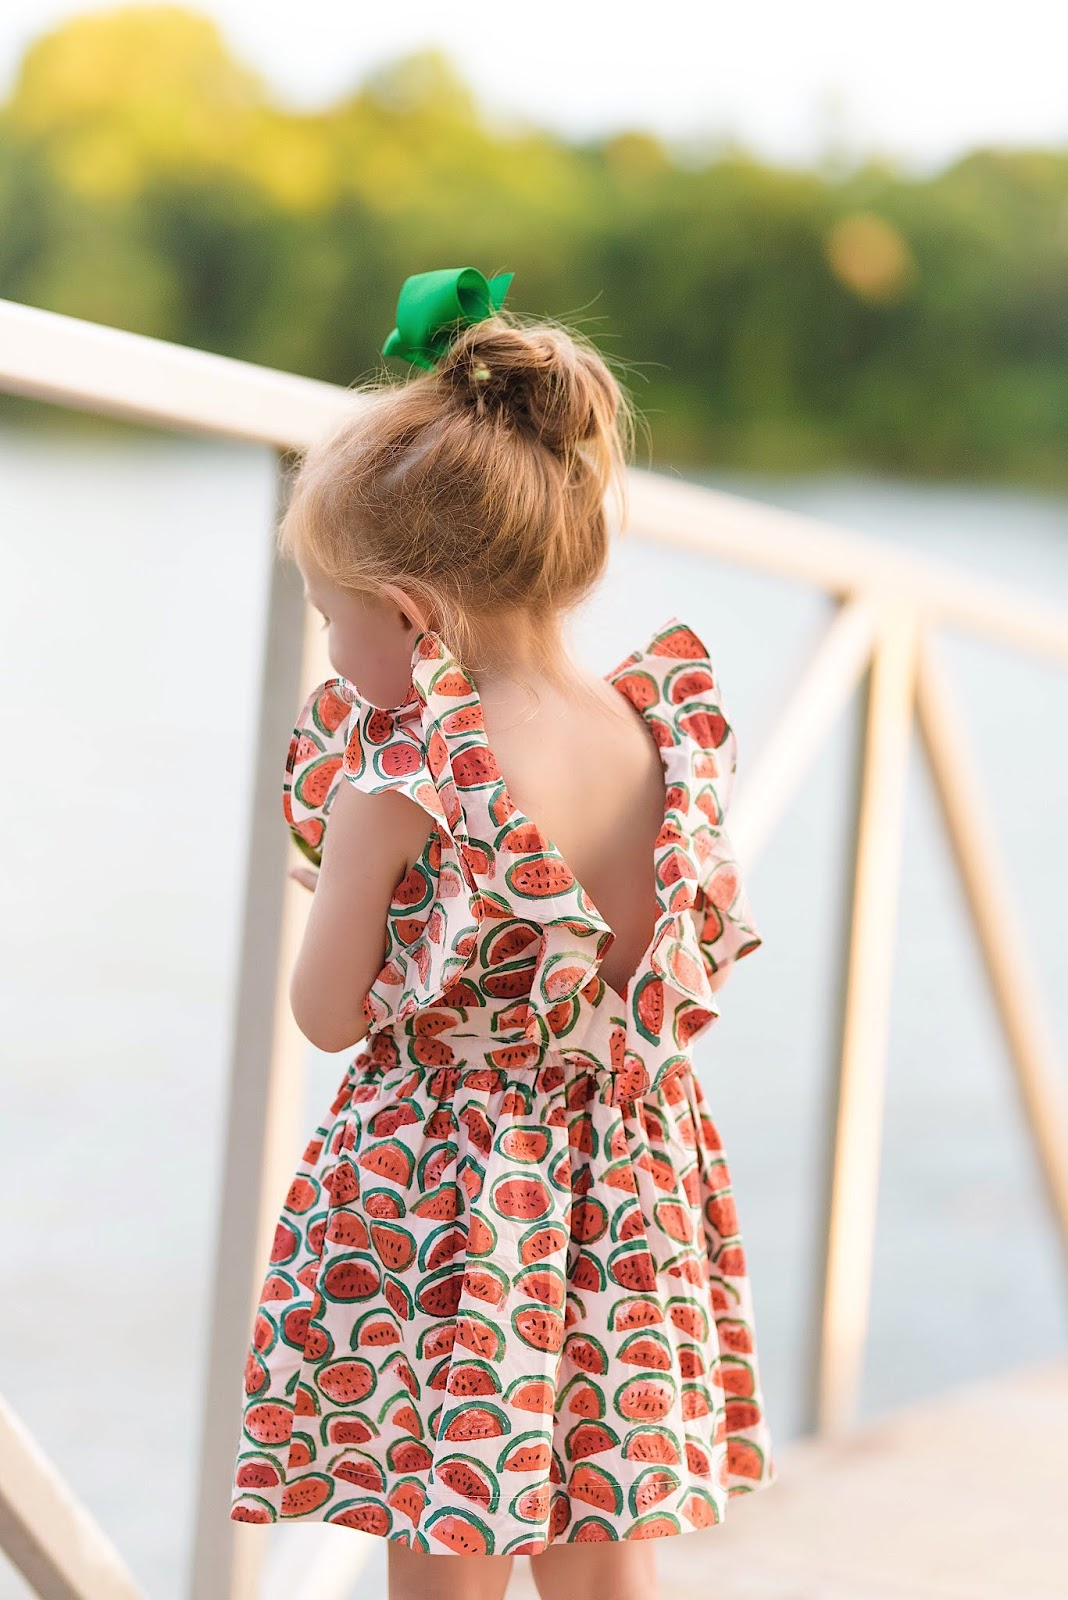 Girls J.Crew Factory Ruffle Watermelon Dress - Something Delightful Blog